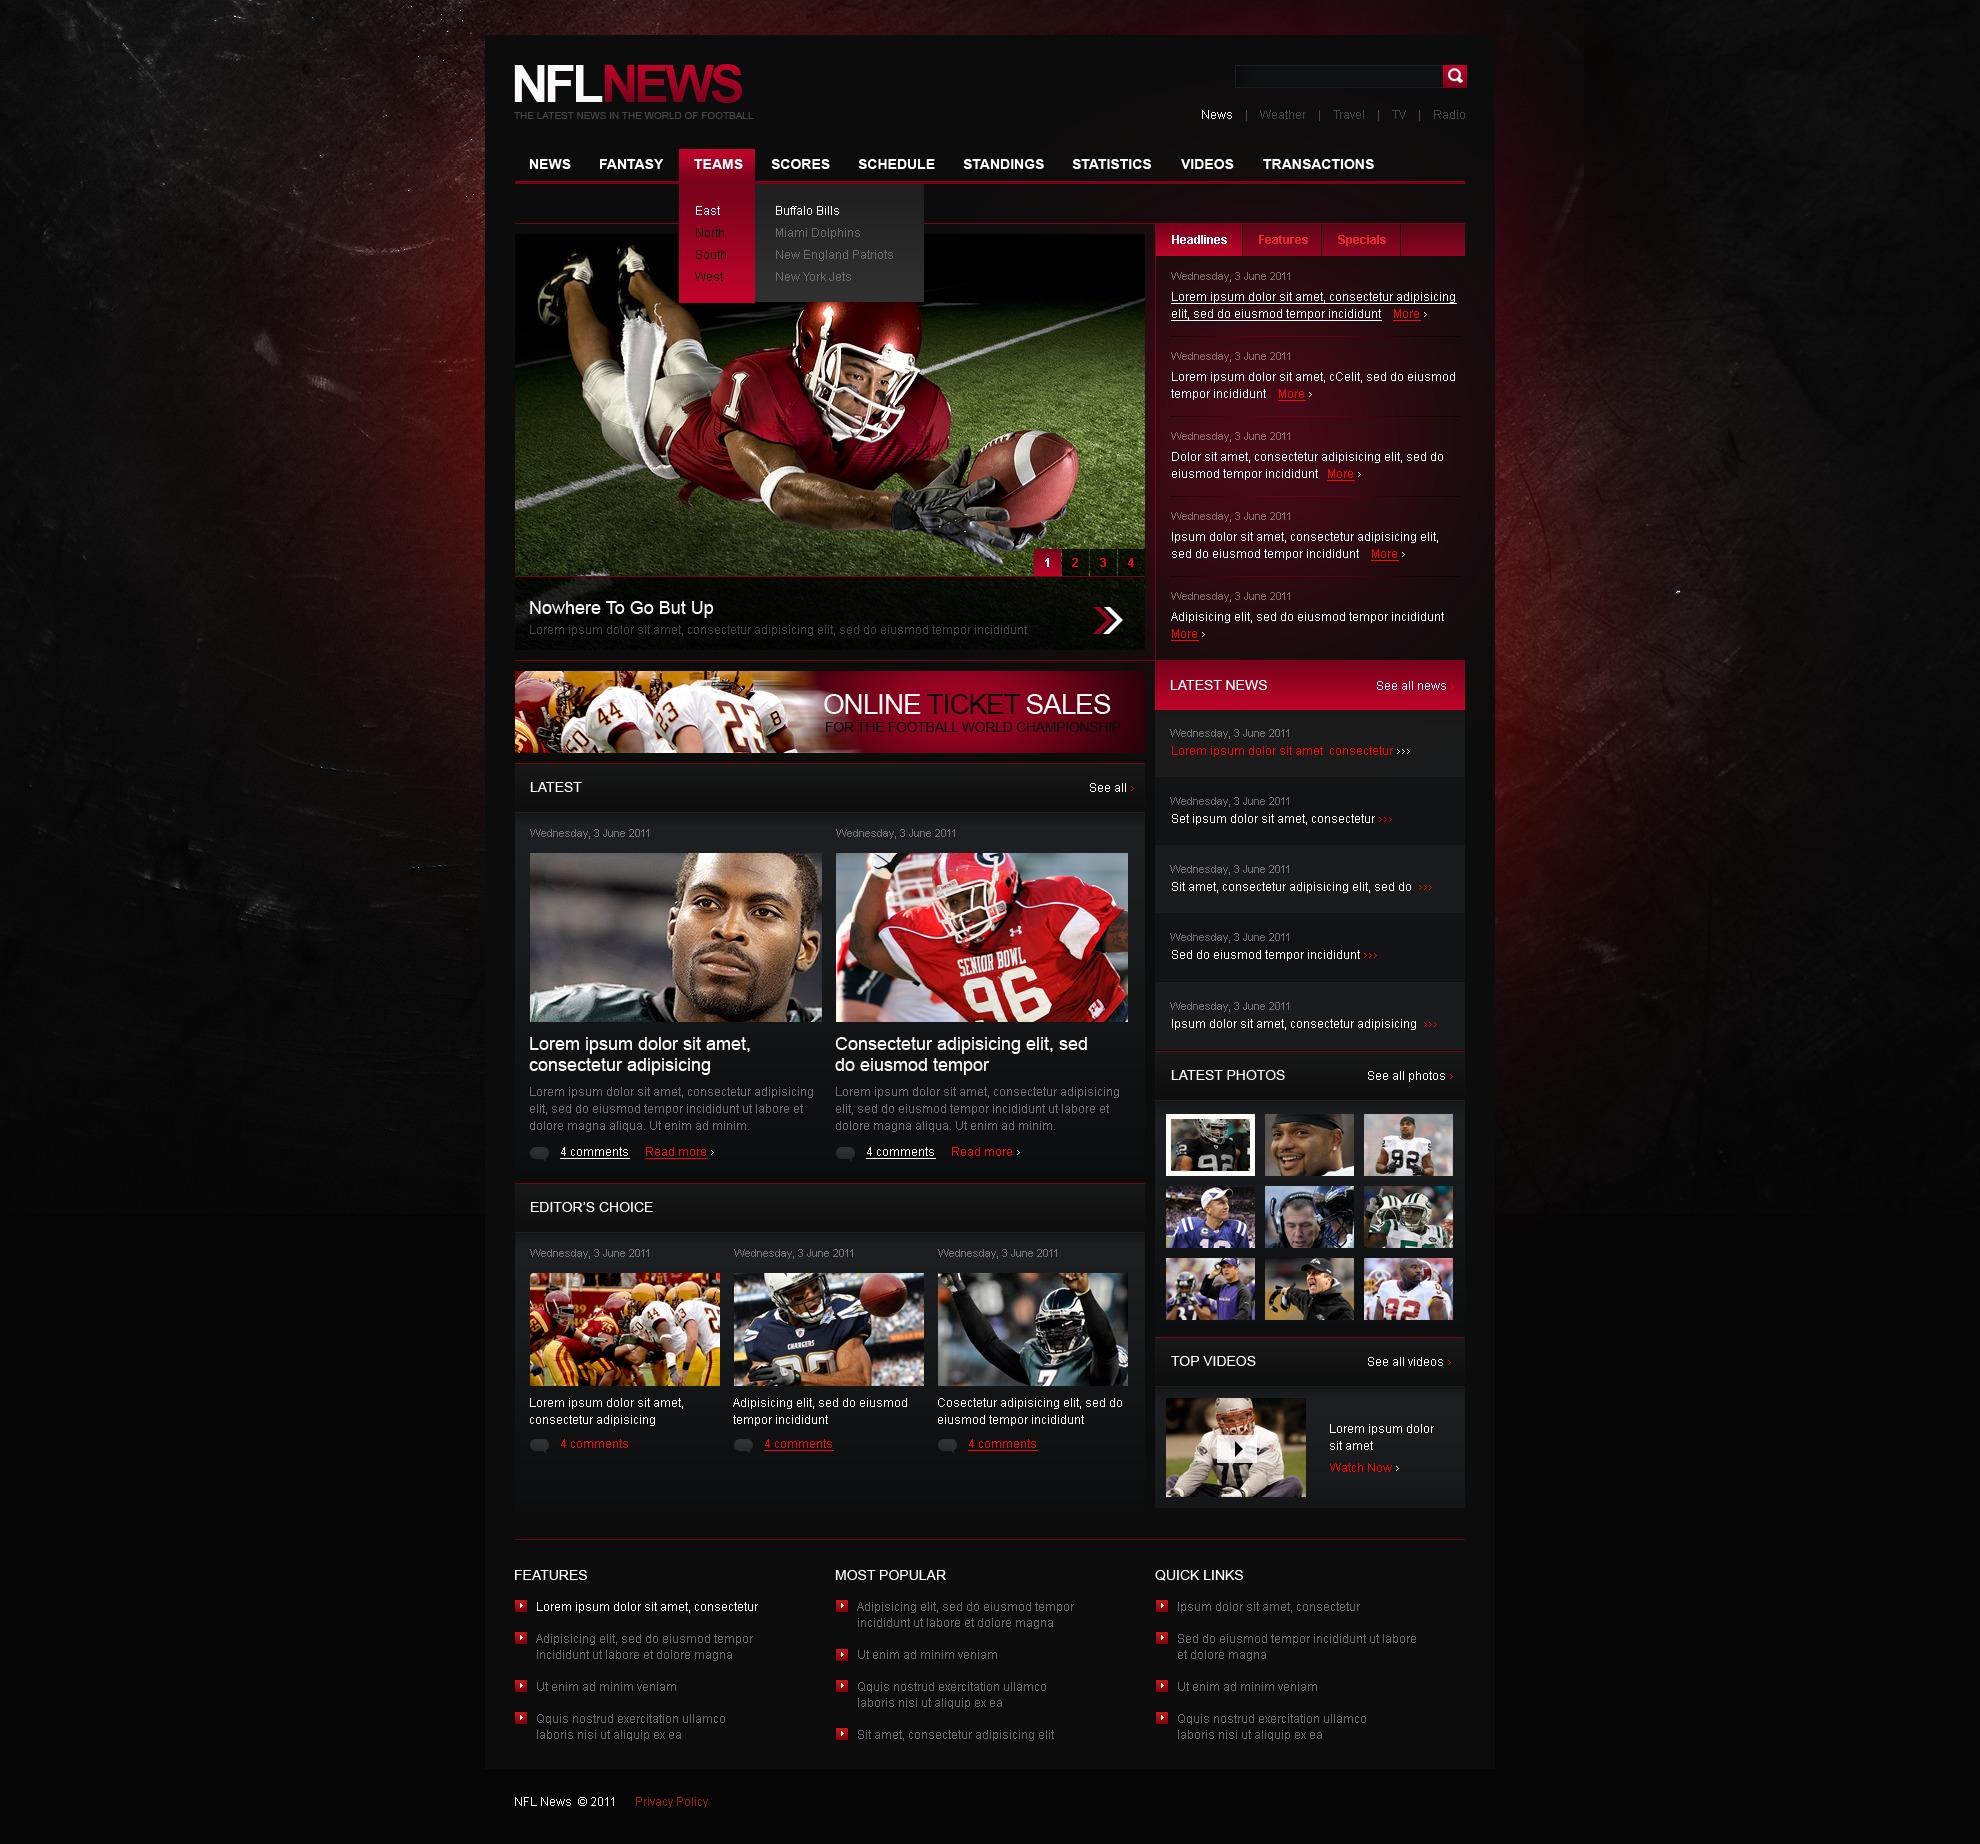 Sports News Templates Psd #37623